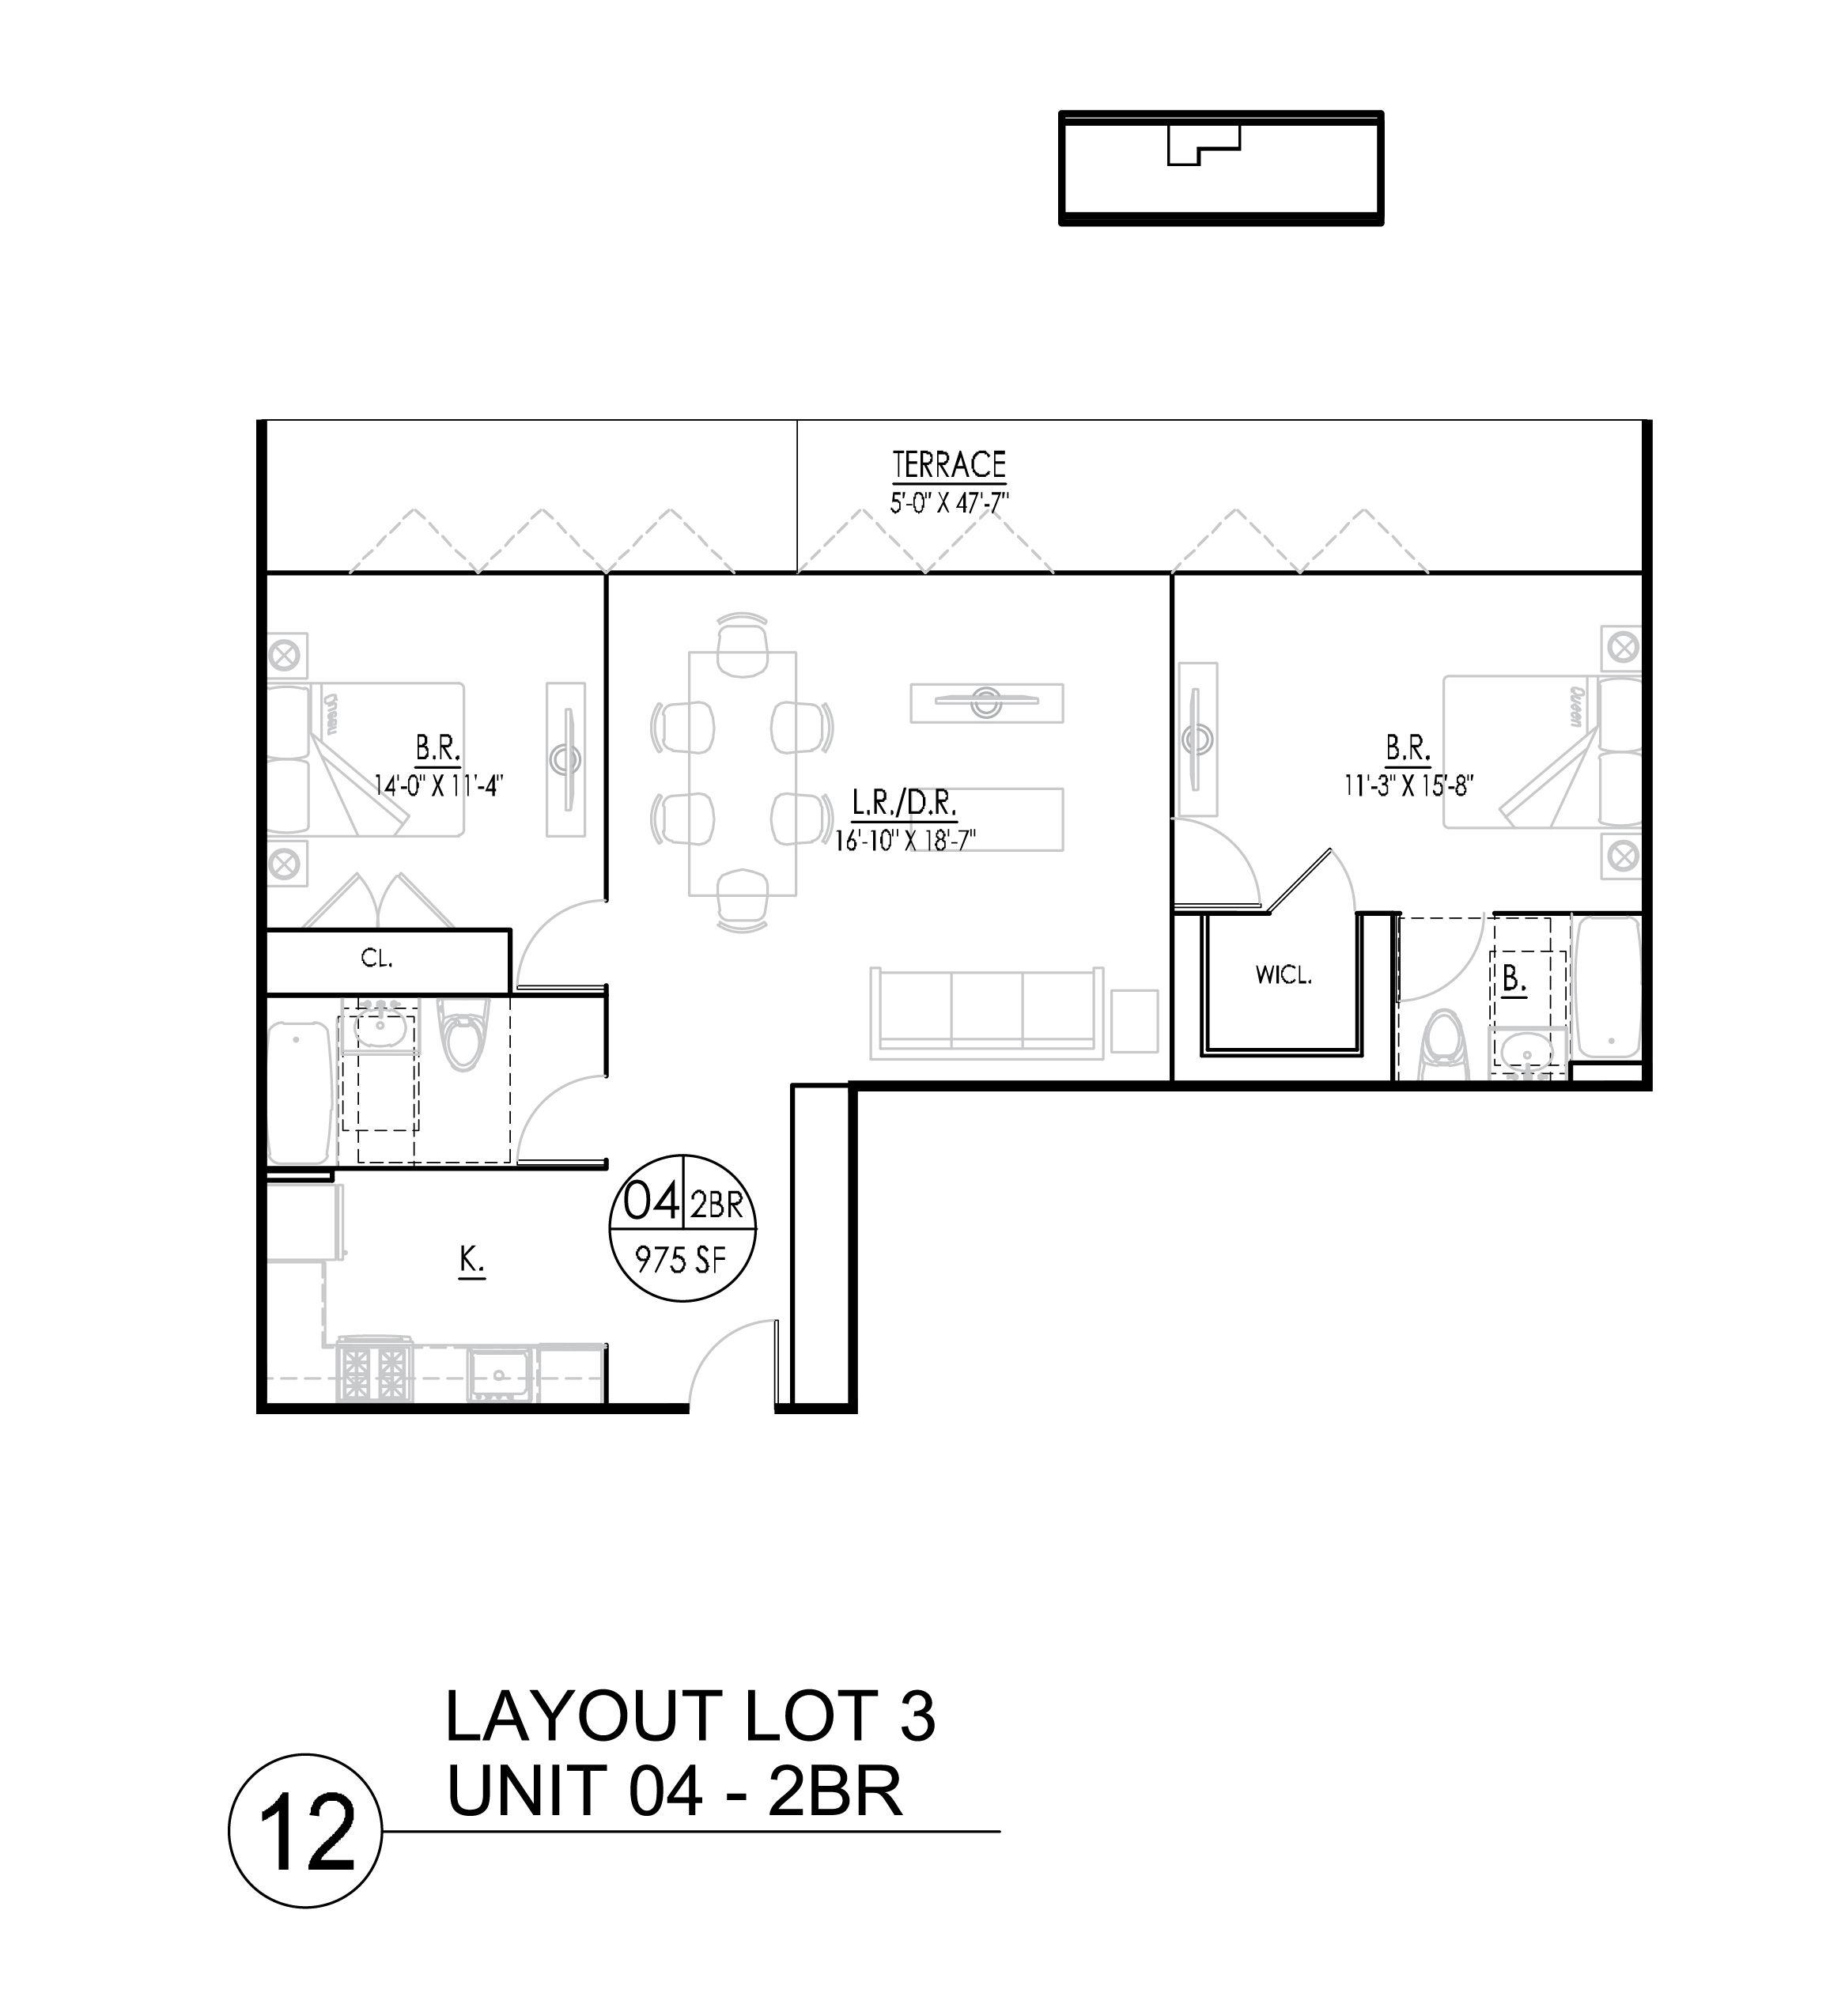 Studio Apartment Size pictures natural studio apartment singapore floor plan | plants